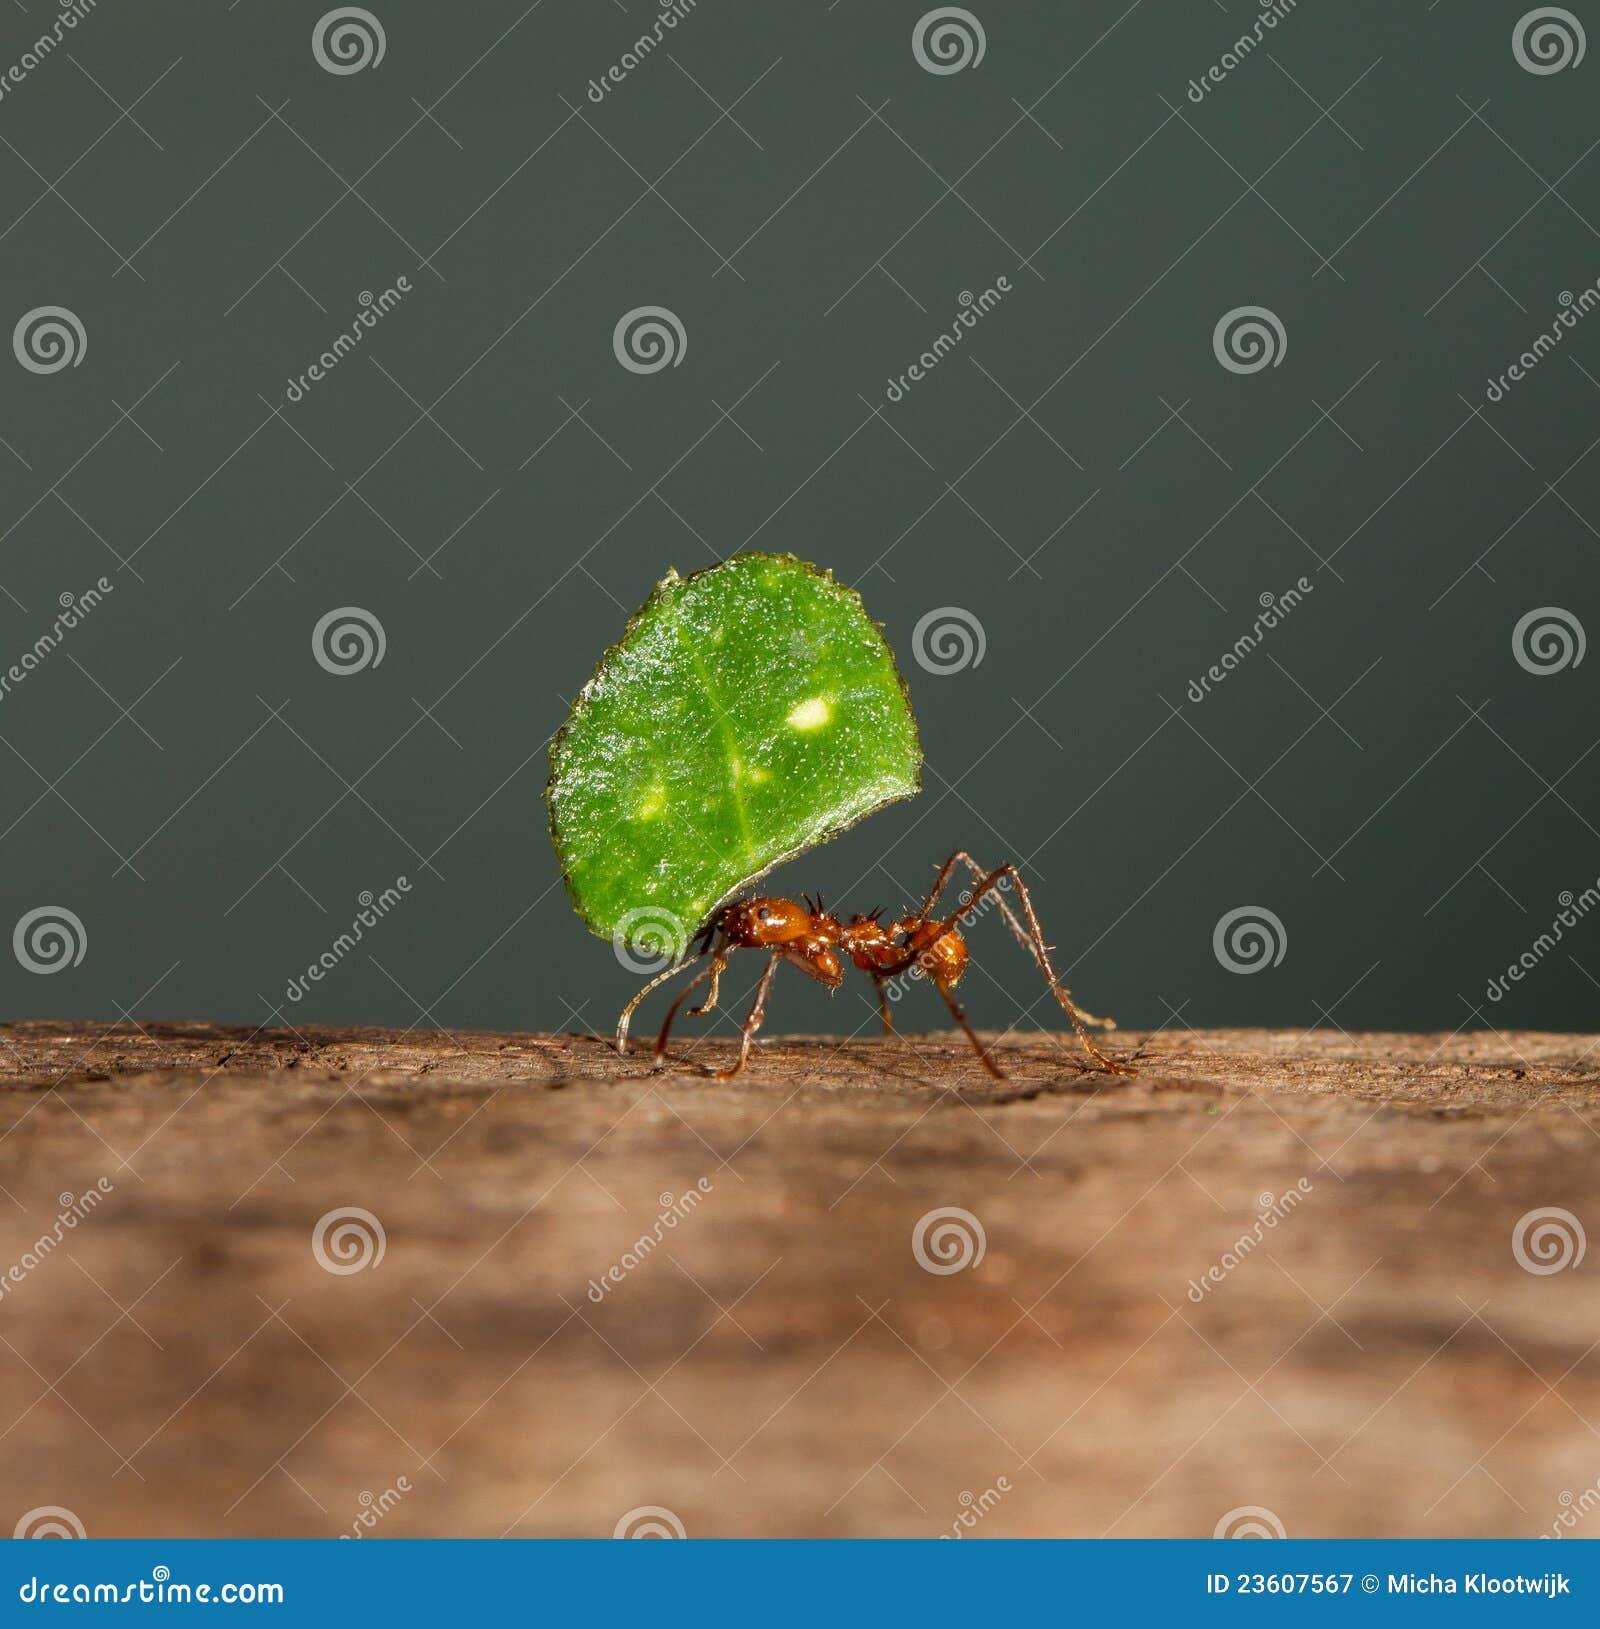 An leaf cutter ant